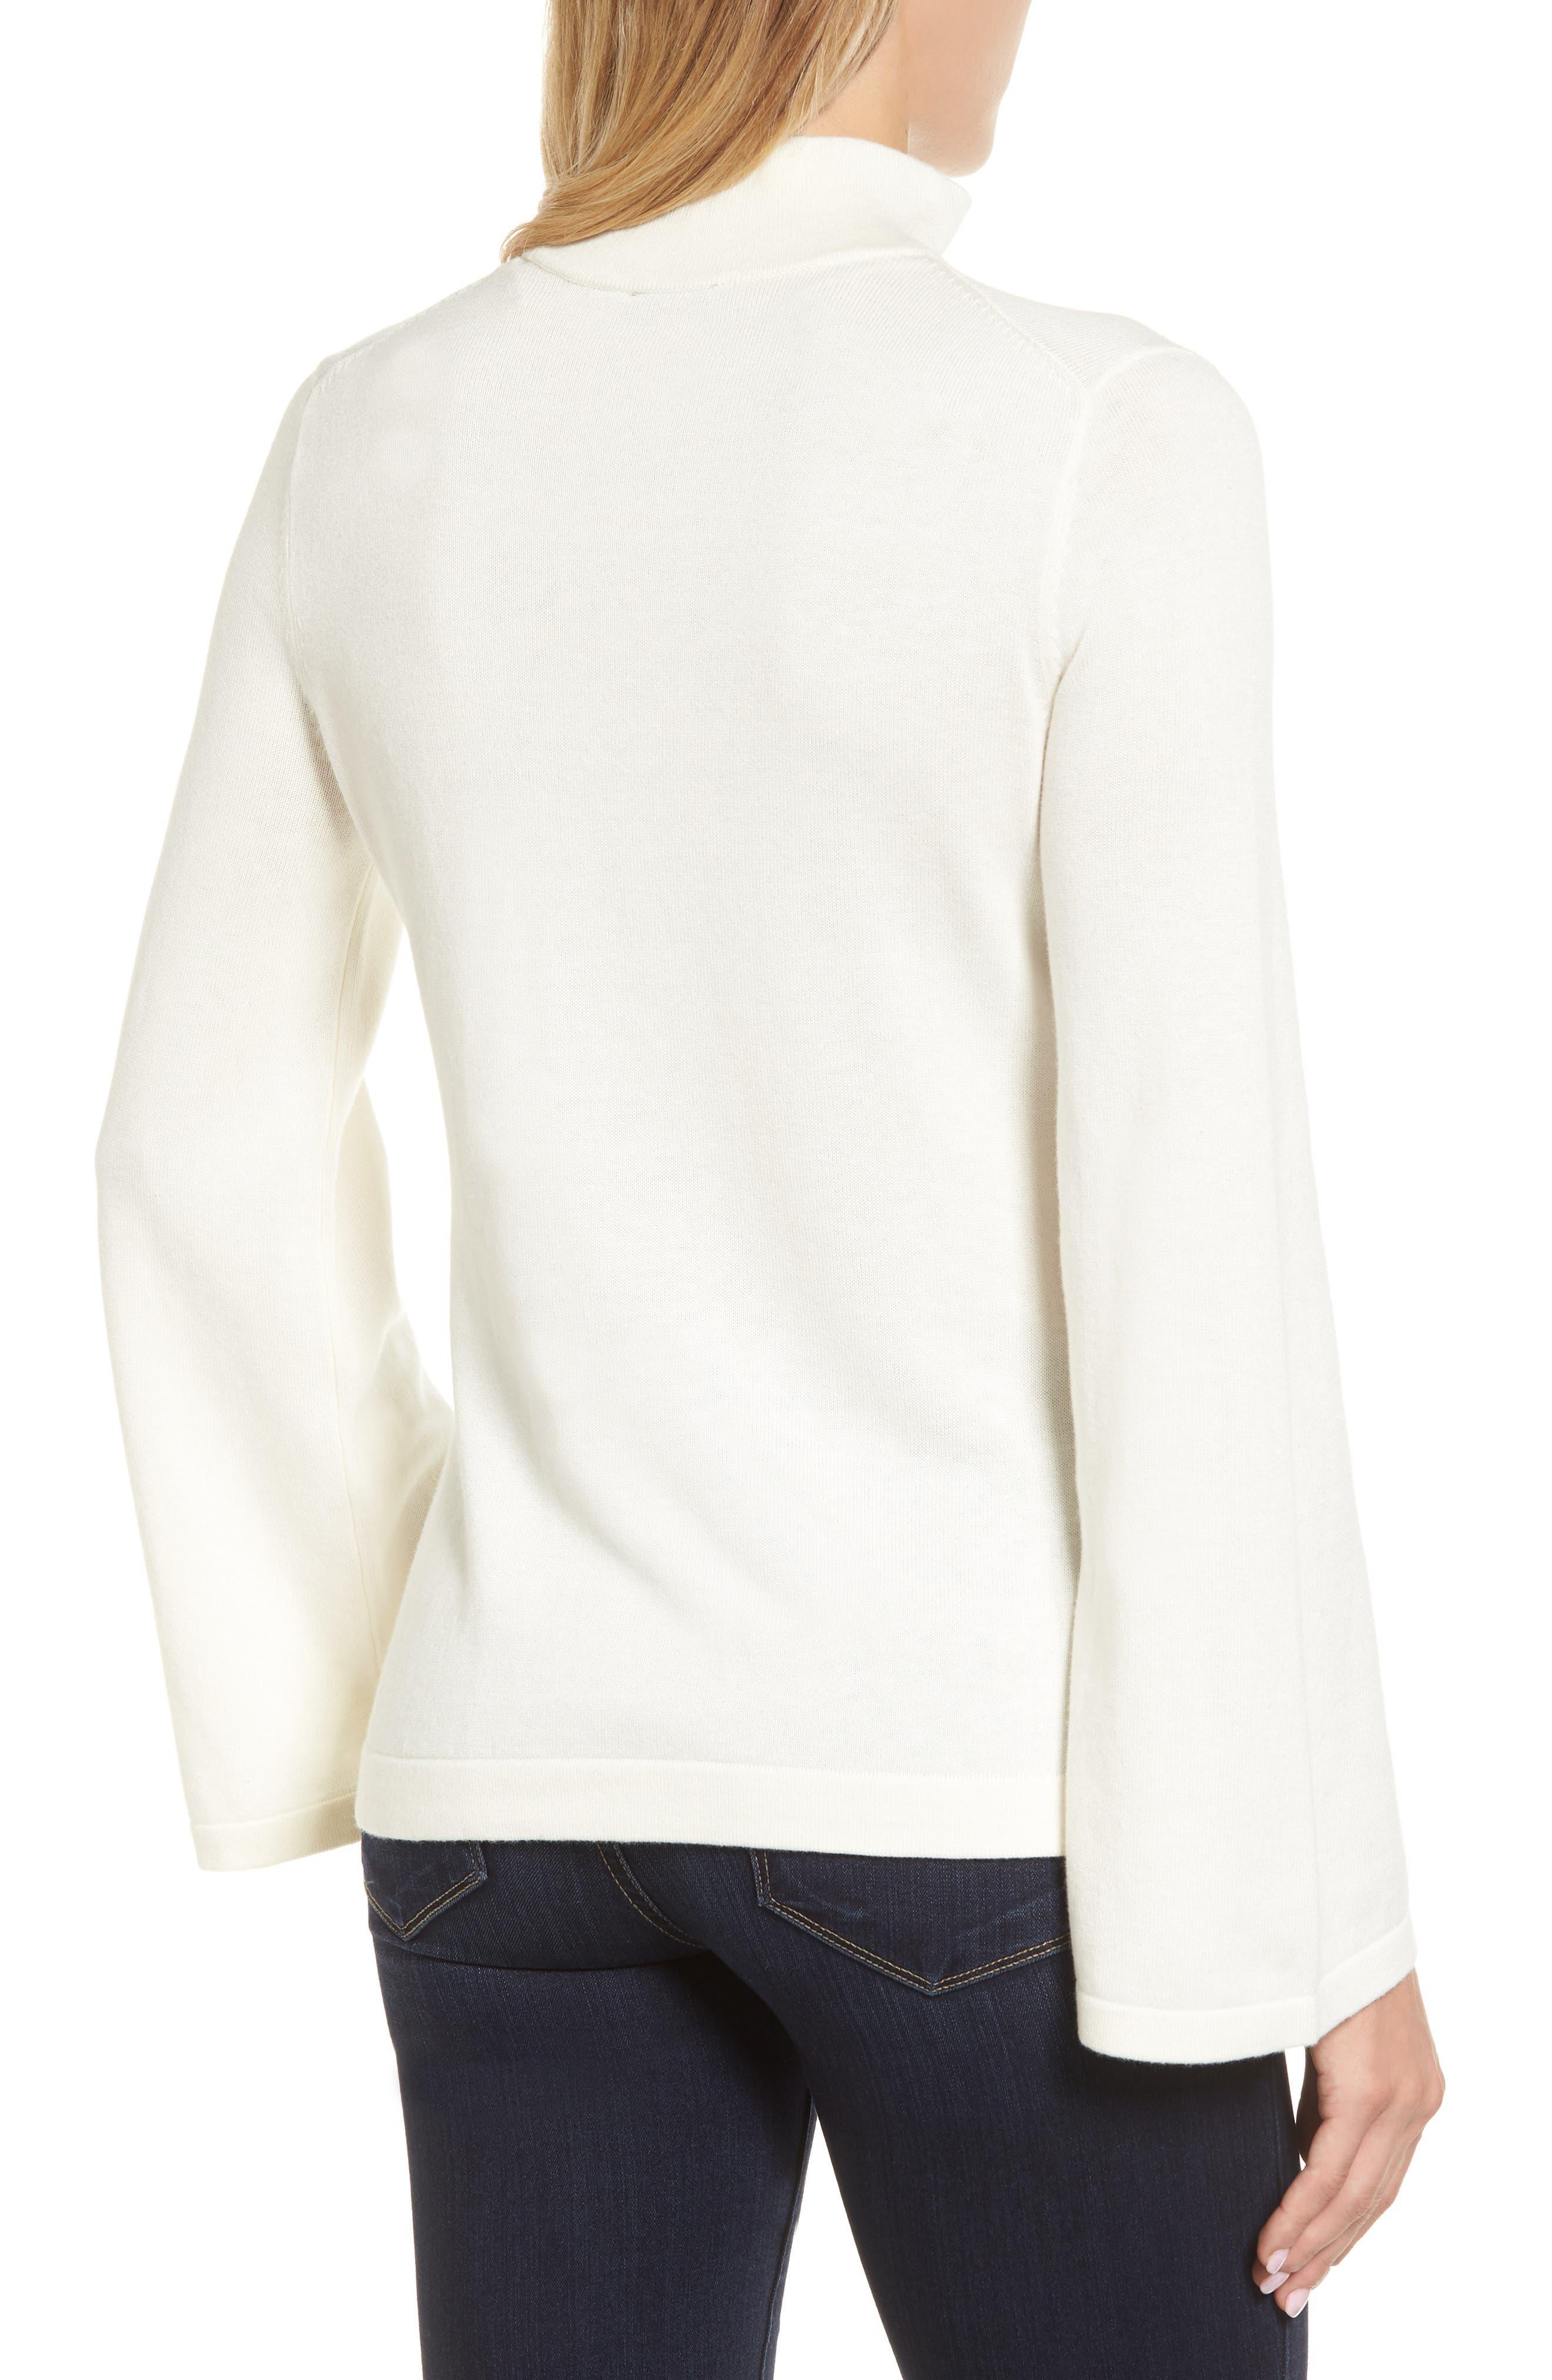 Bell Sleeve Choker Neck Sweater,                             Alternate thumbnail 2, color,                             Antique White